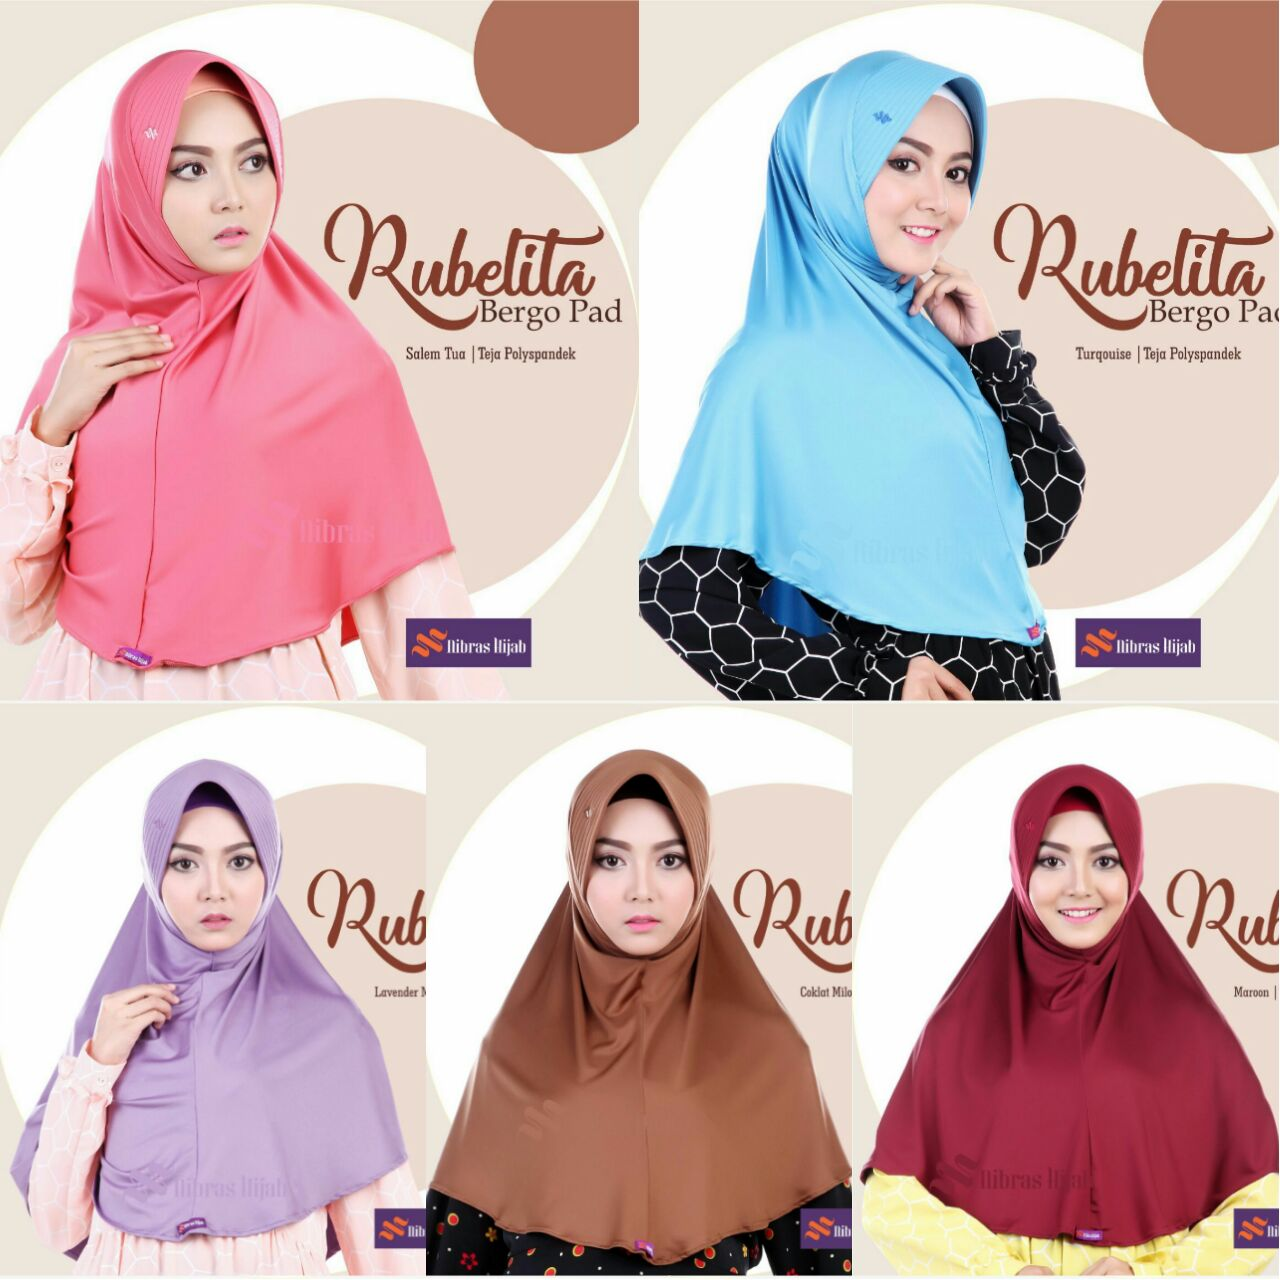 Koleksi Nibras Hijab Terbaru Rubelita Bergo Pad